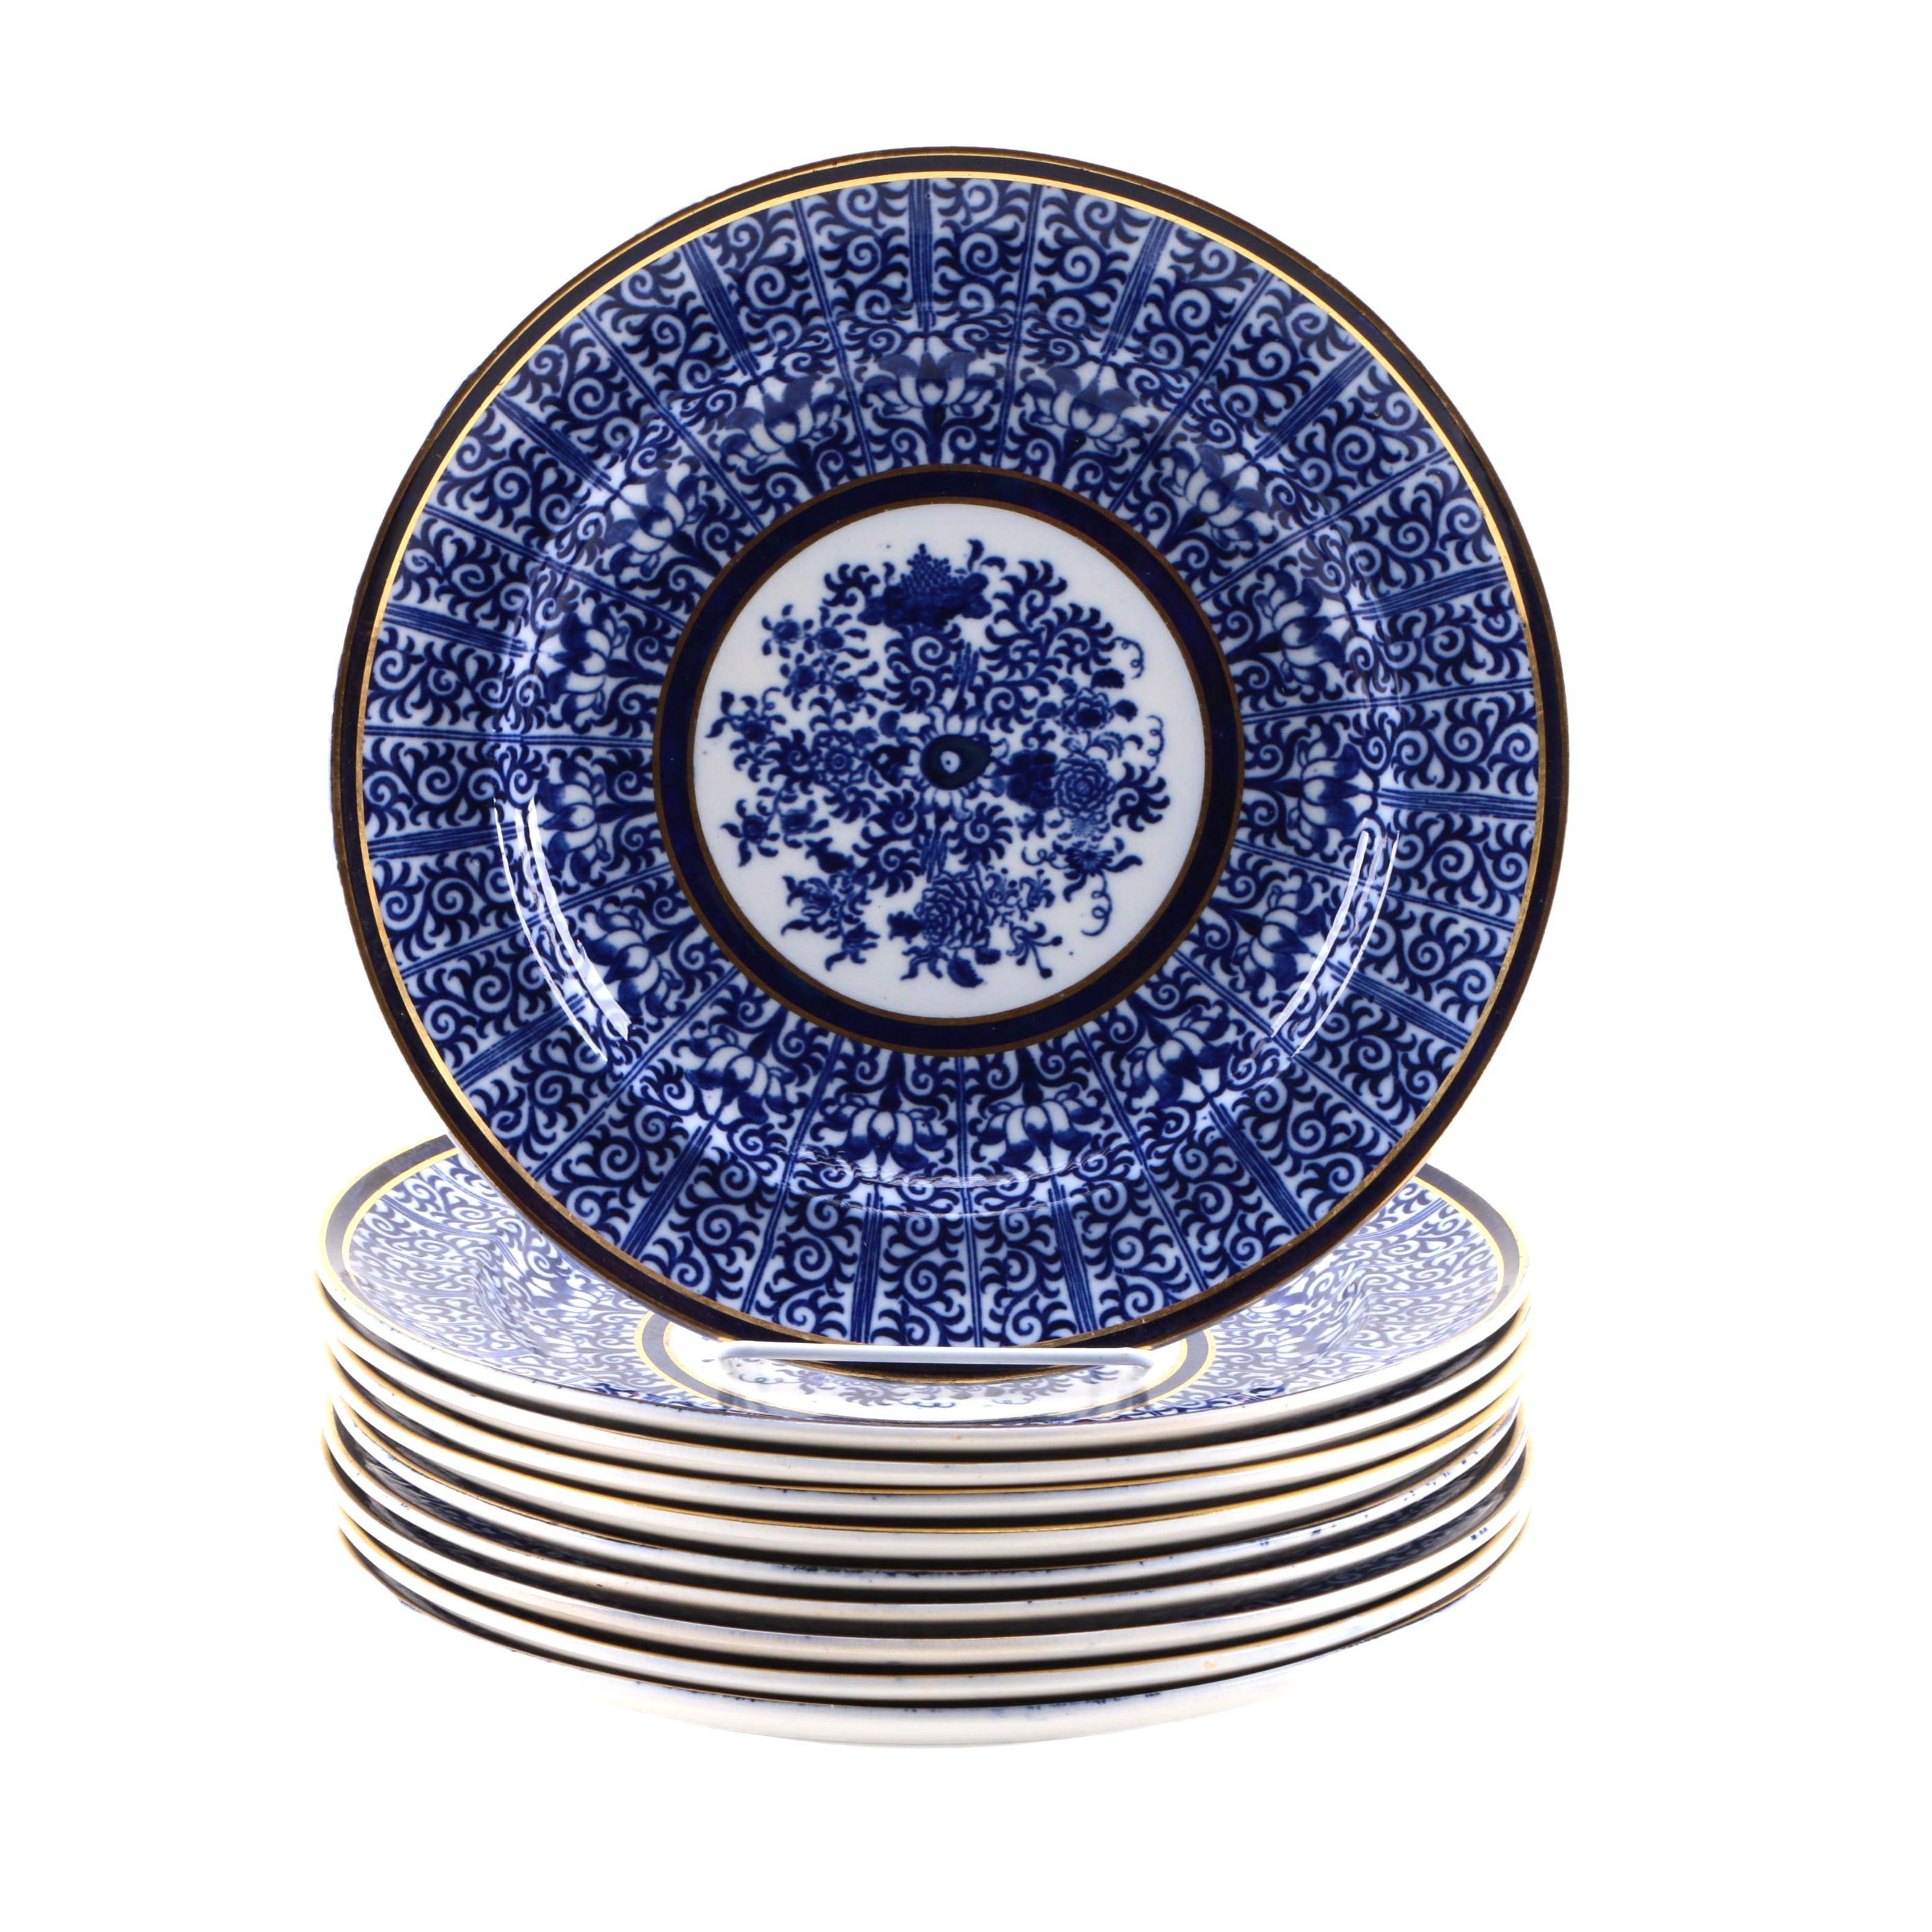 Antique Minton Blue Transfer Printed Plates Circa 1879